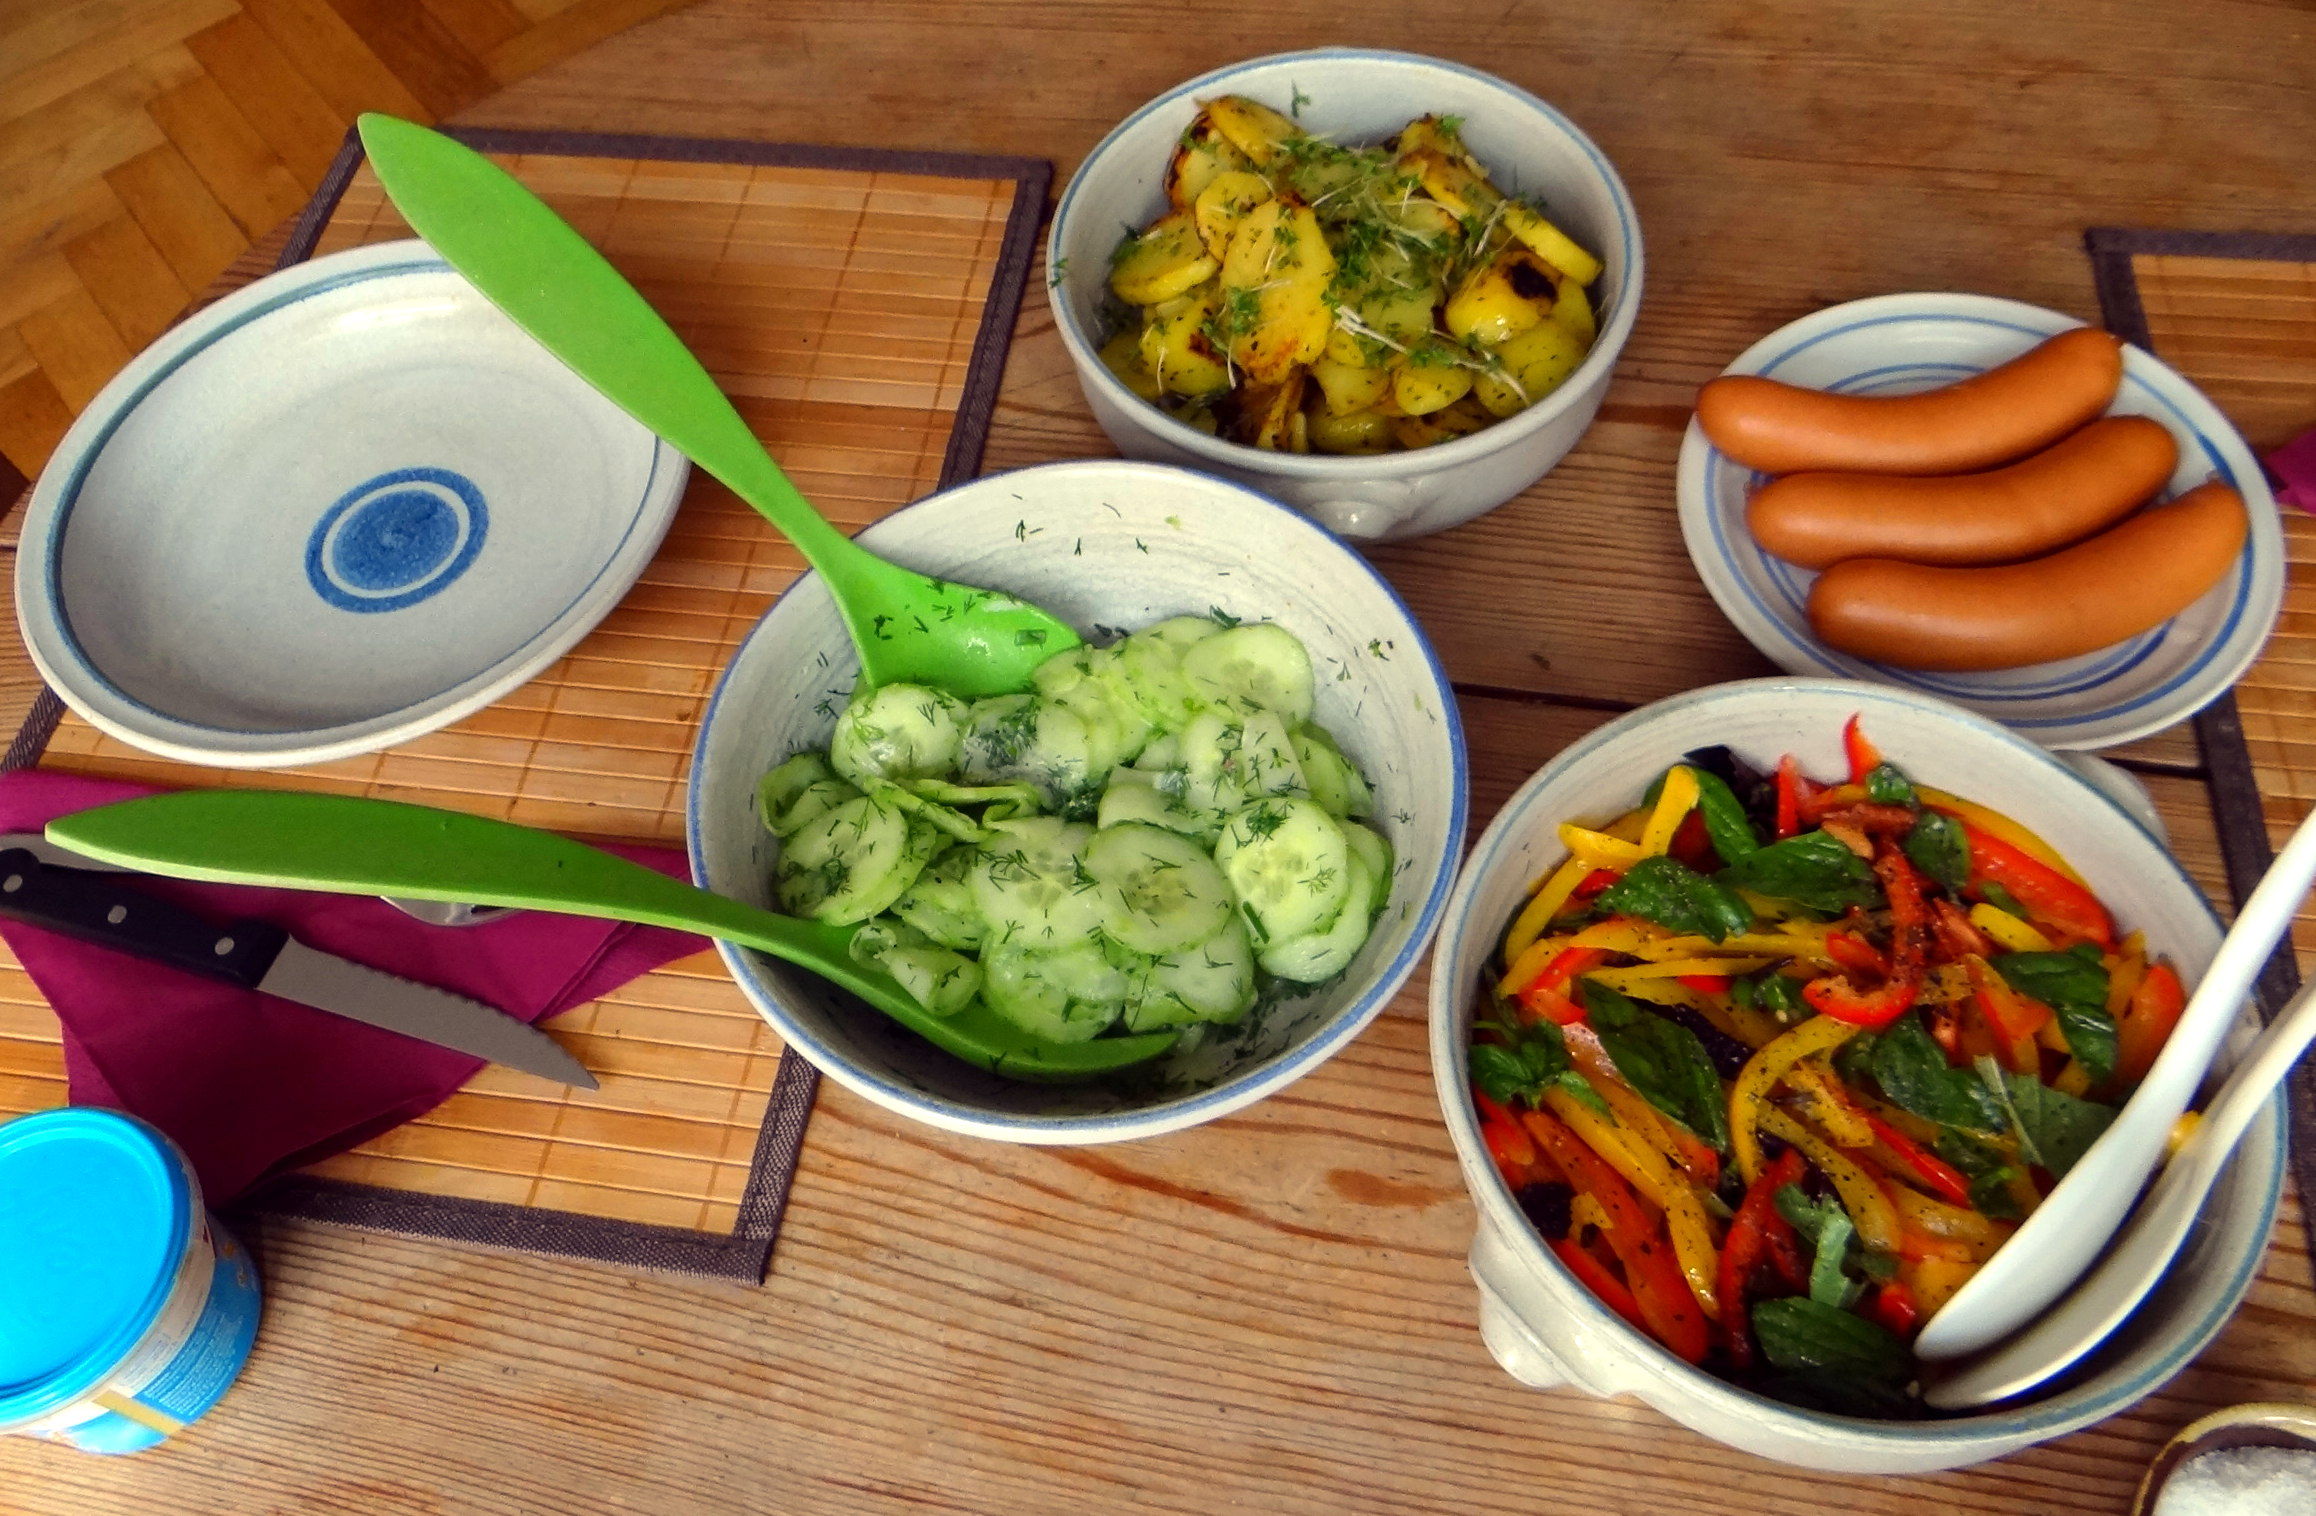 Bratkartoffel,Bockwurst,Salate (3)